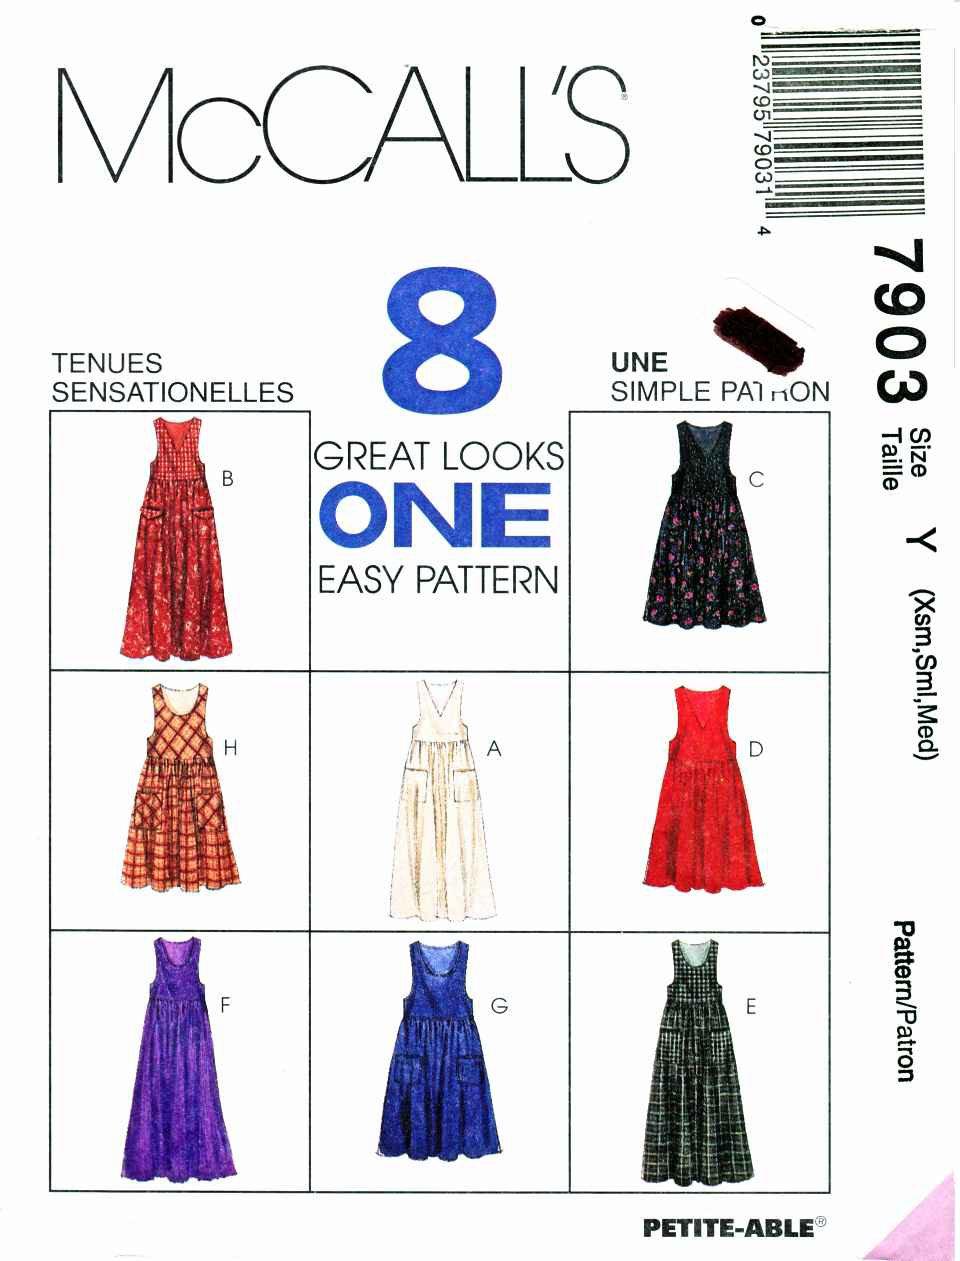 McCalls Sewing Pattern 7903 Misses Size 4-14 Easy Jumpers Length Neckline Pocket Options